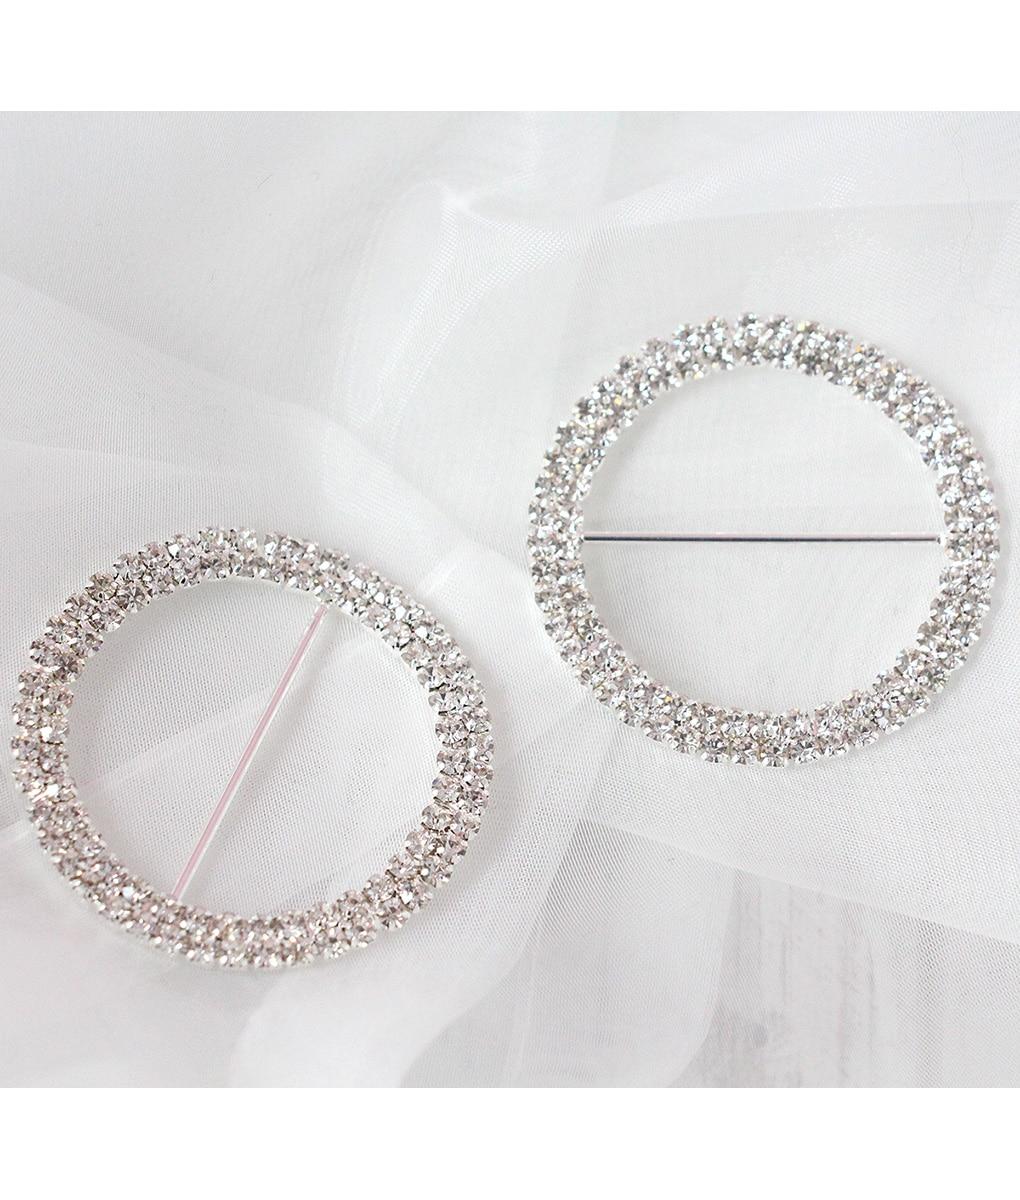 Alila-Crystal-Sliders-Dress-Accessories